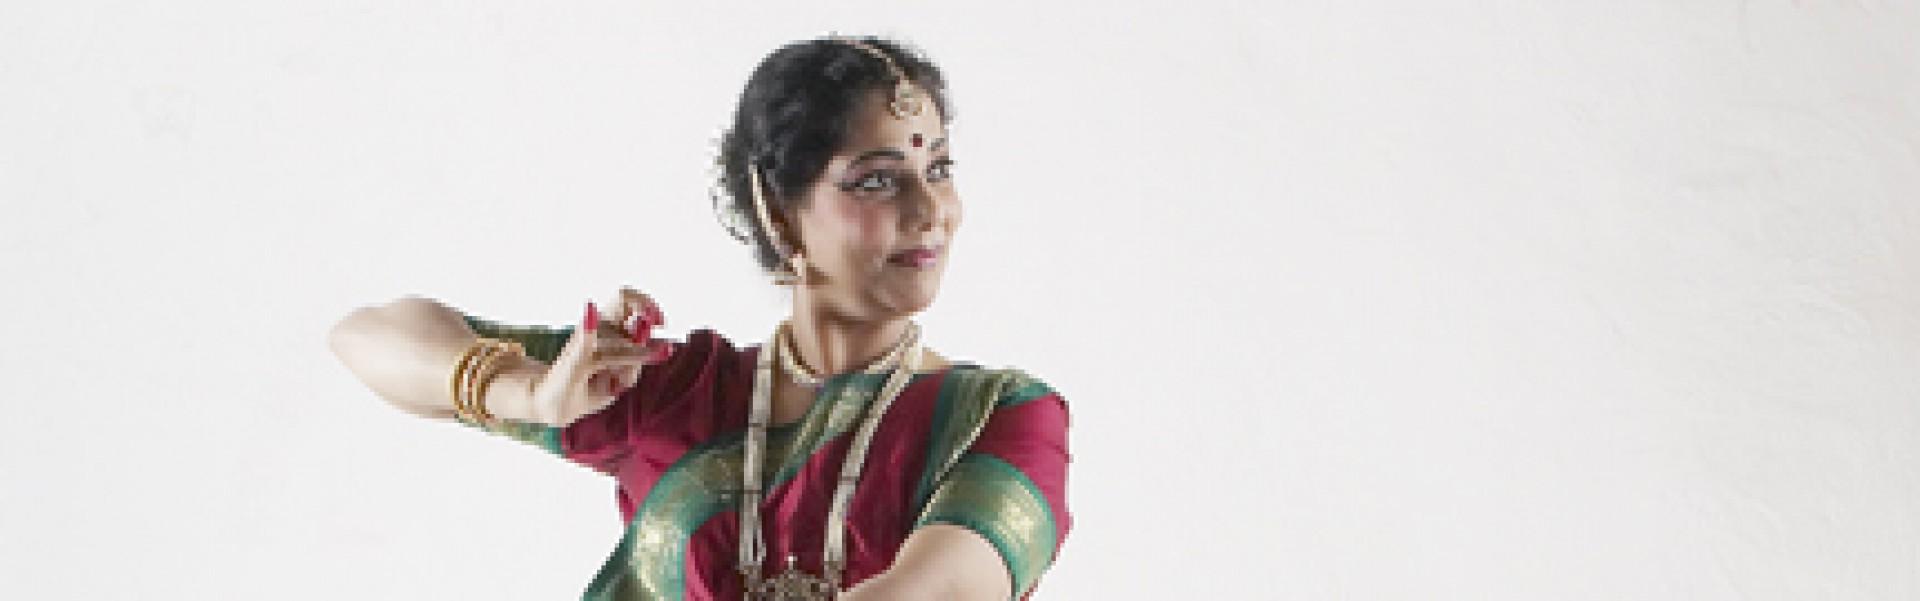 Pushpanjali Dance